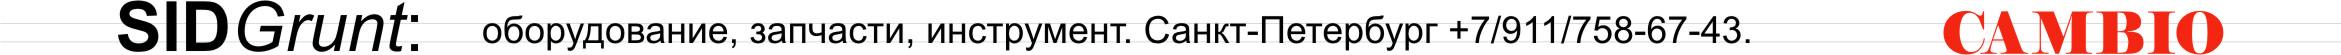 line of Cambio